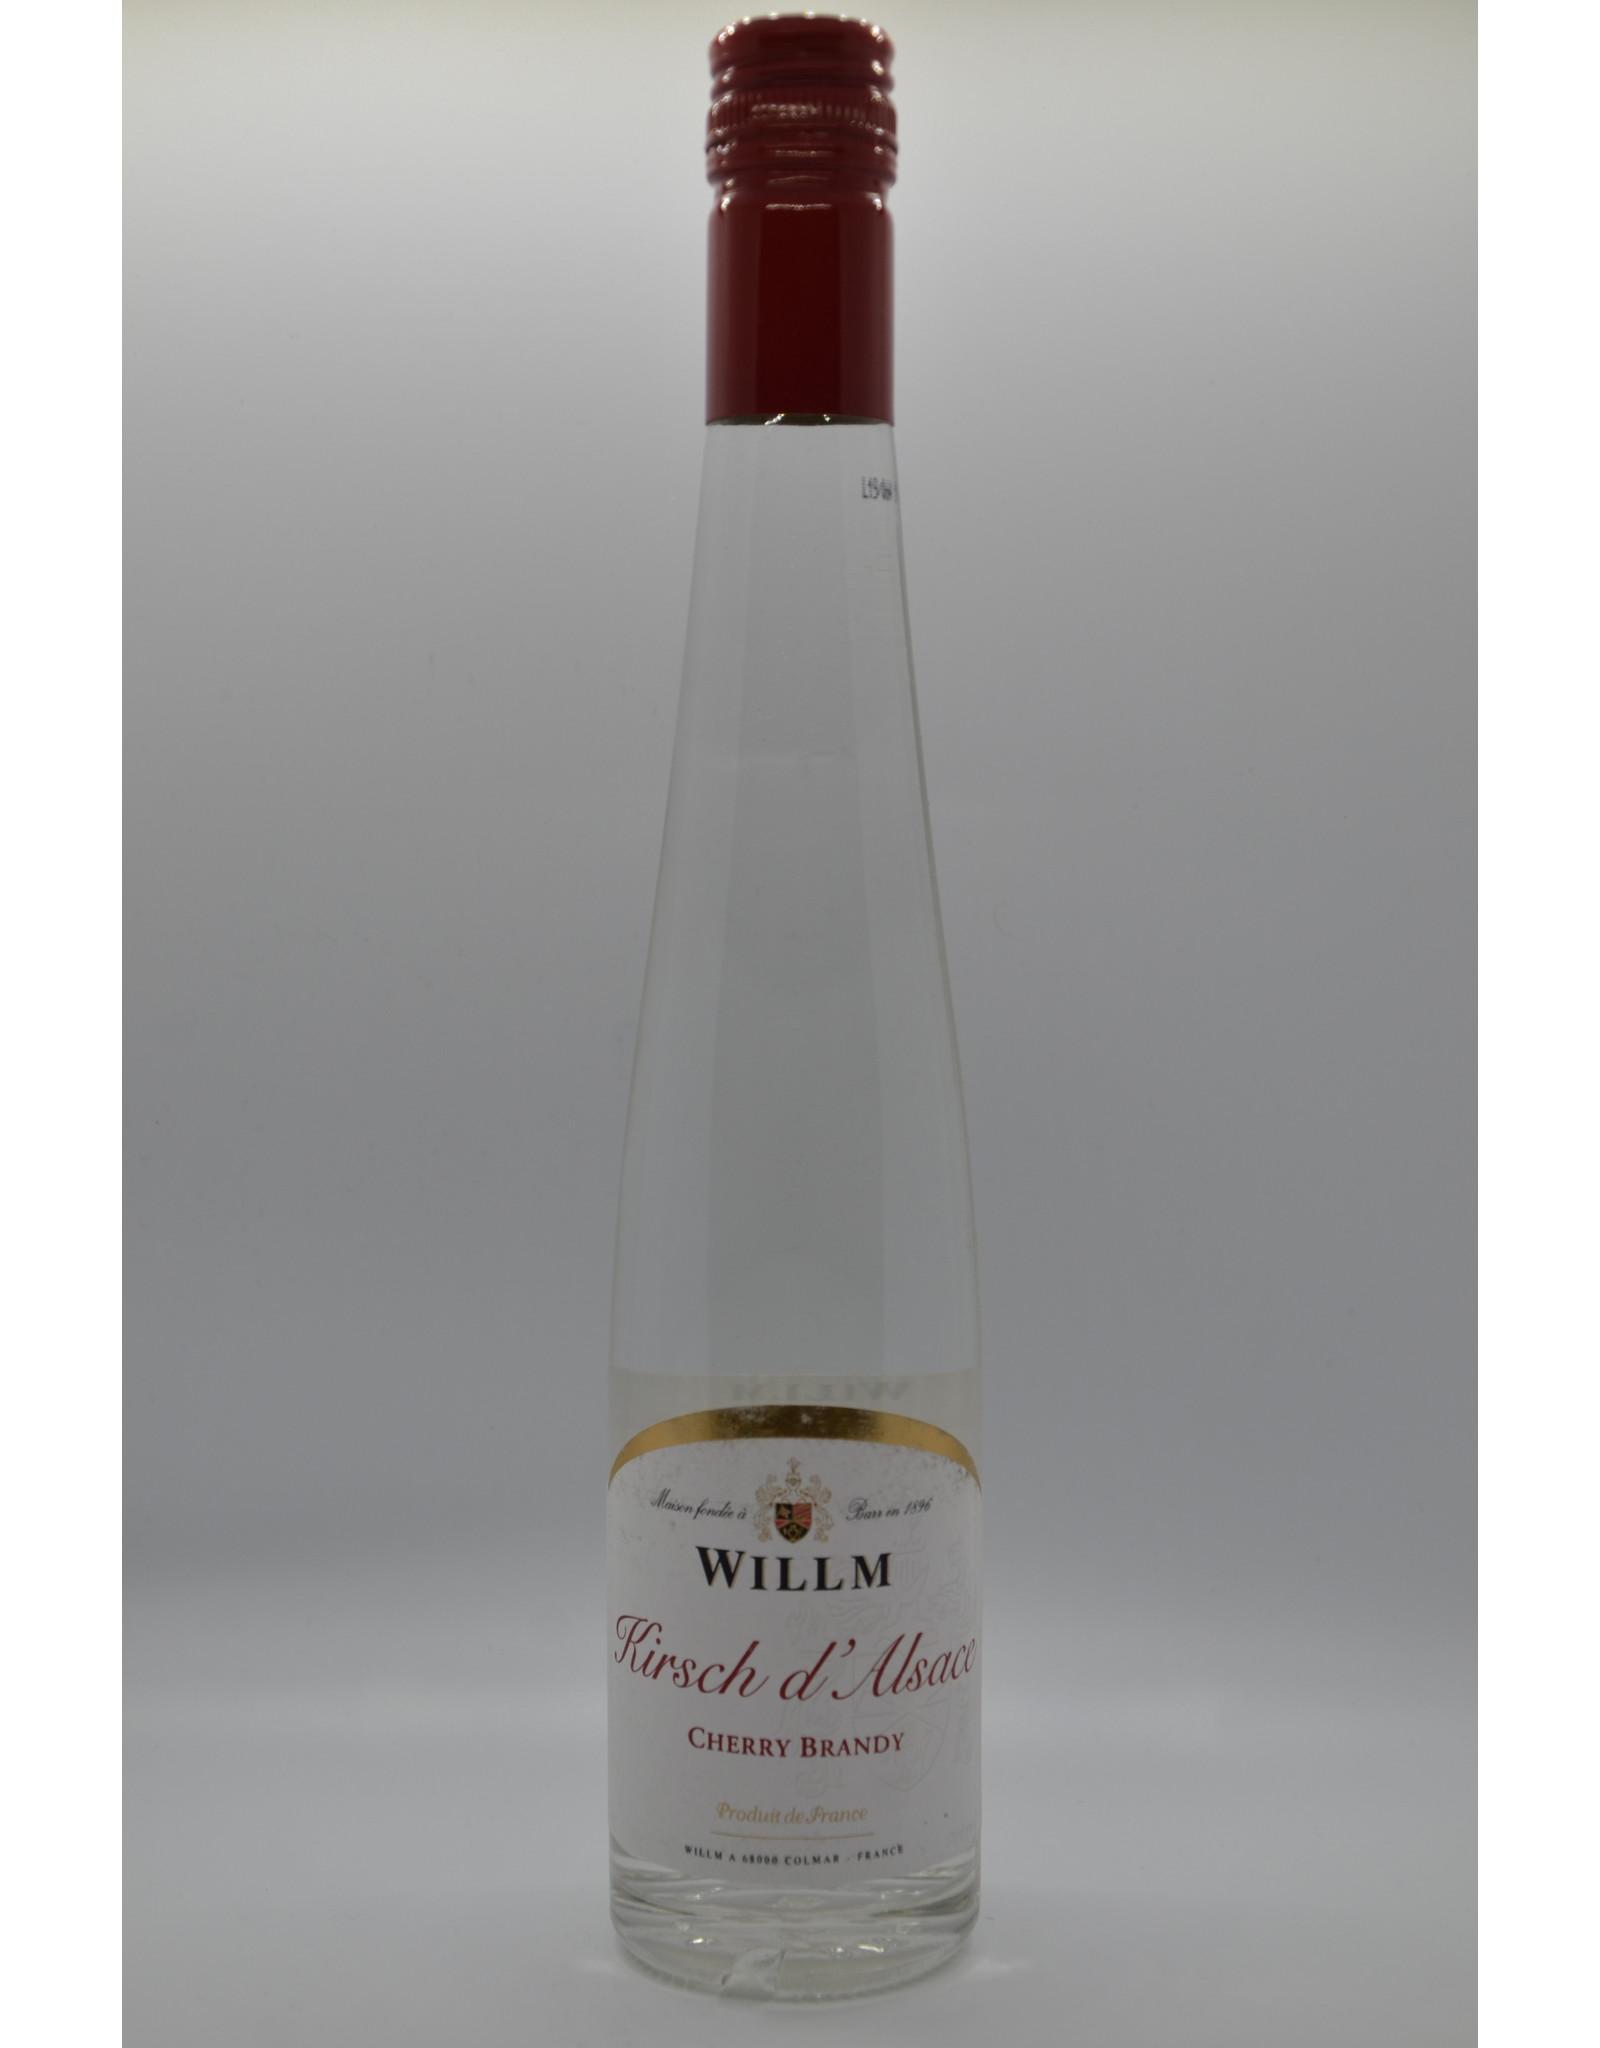 France Willm Kirsch Cherry Brandy 375ml